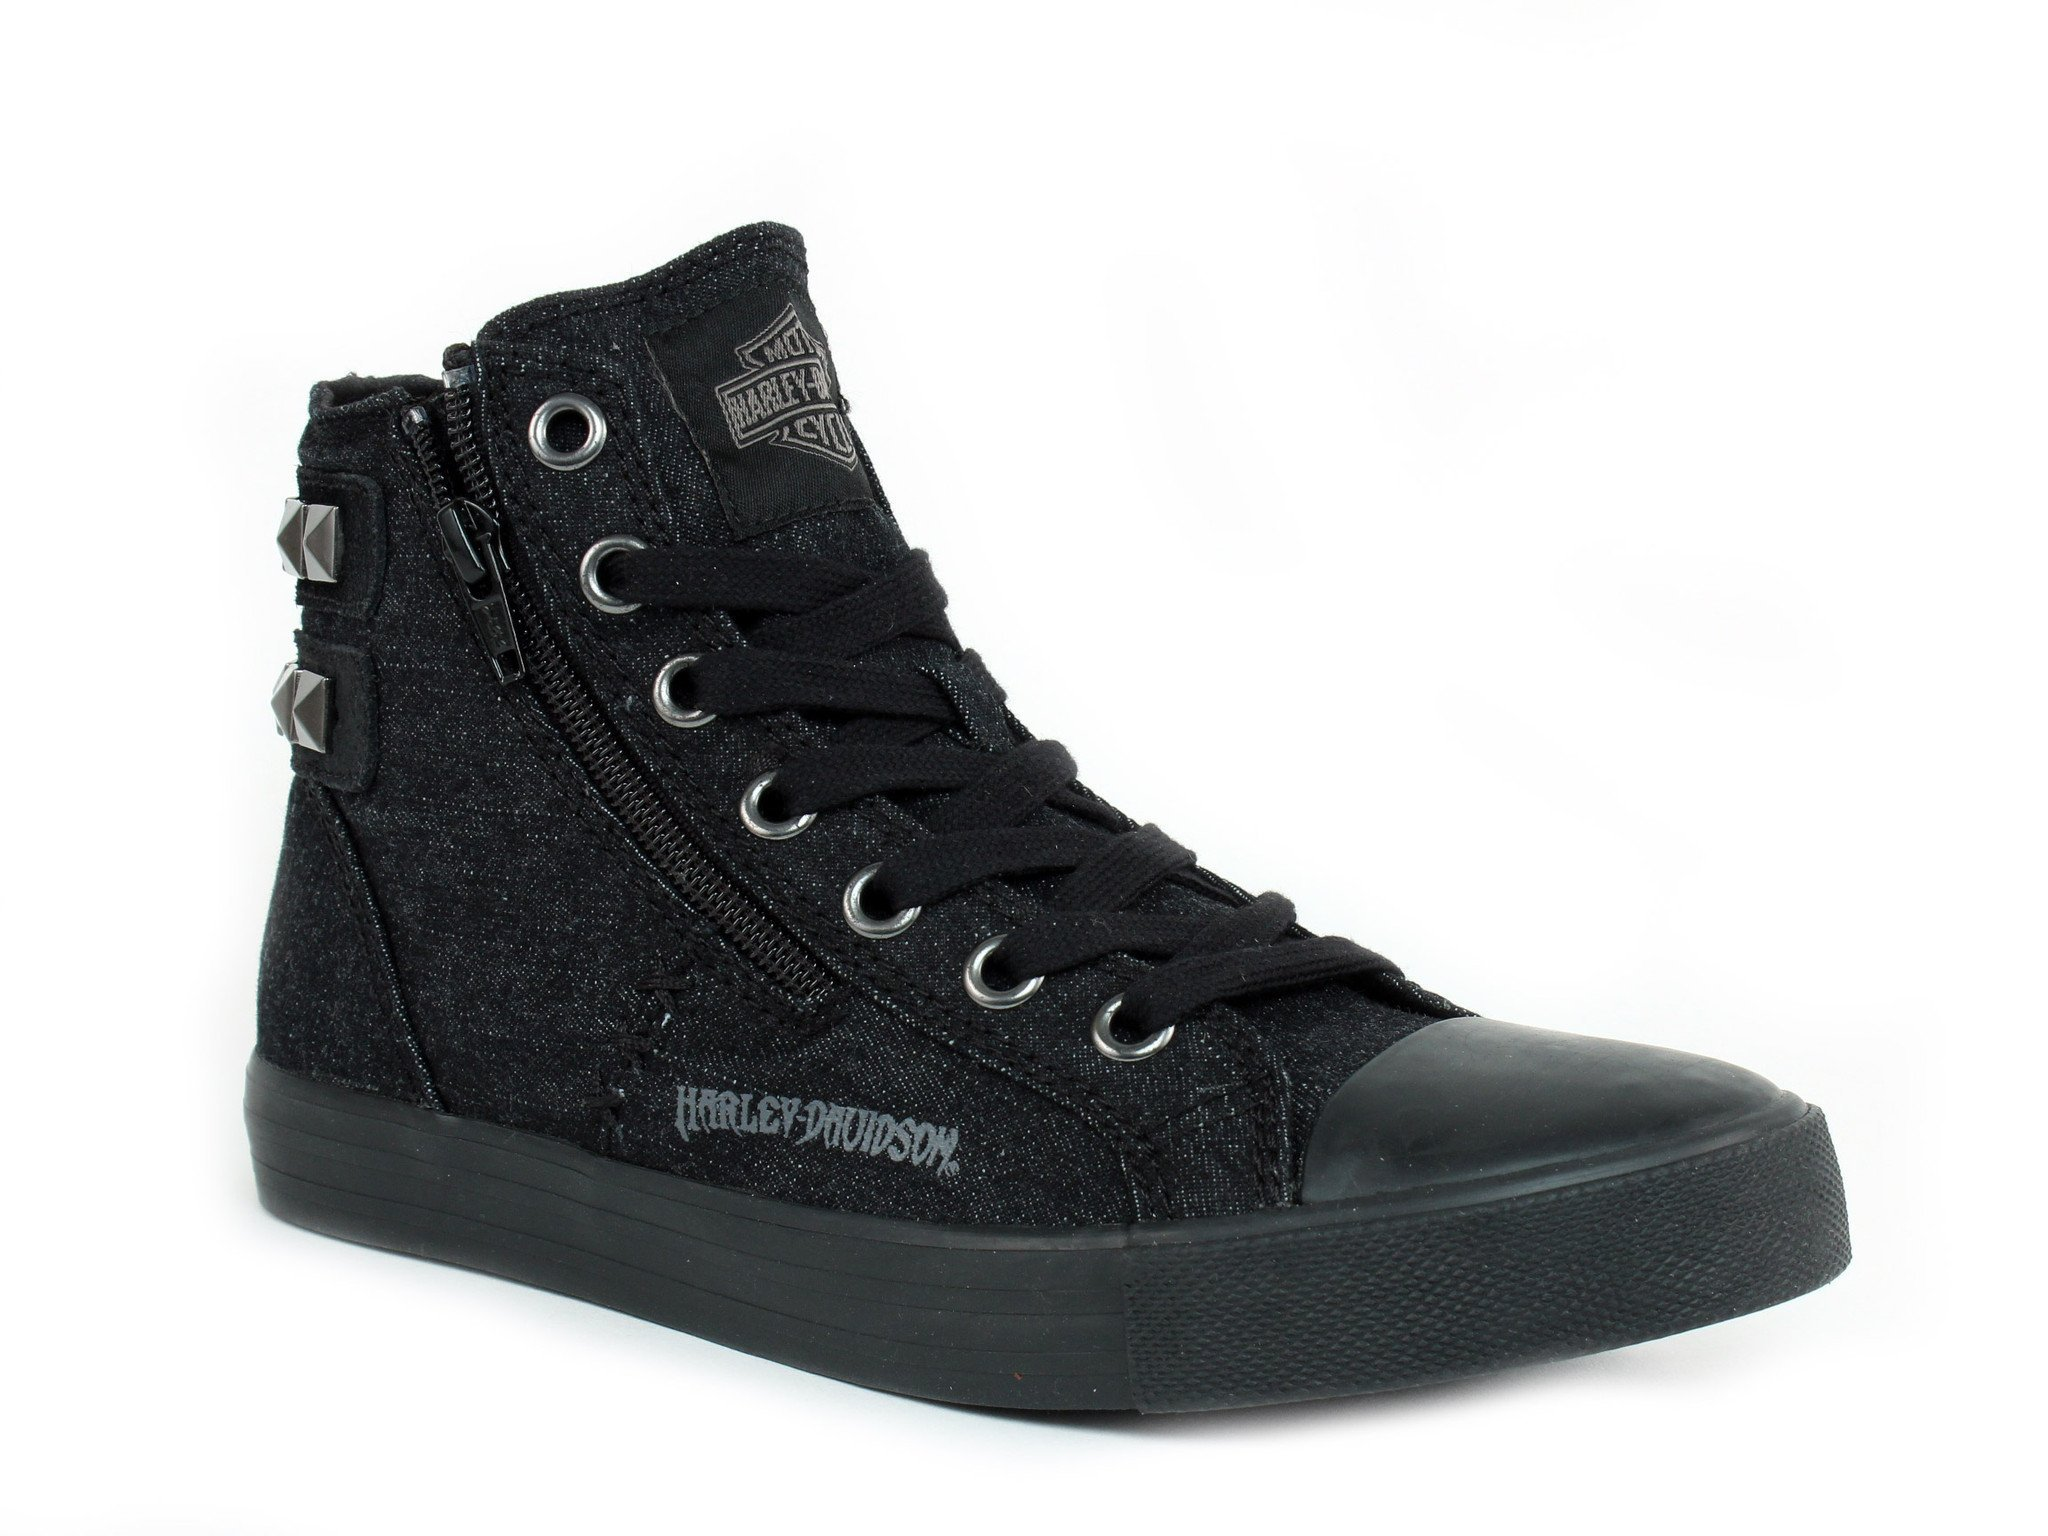 Harley Davidson Jade Women's Fashion Sneakers